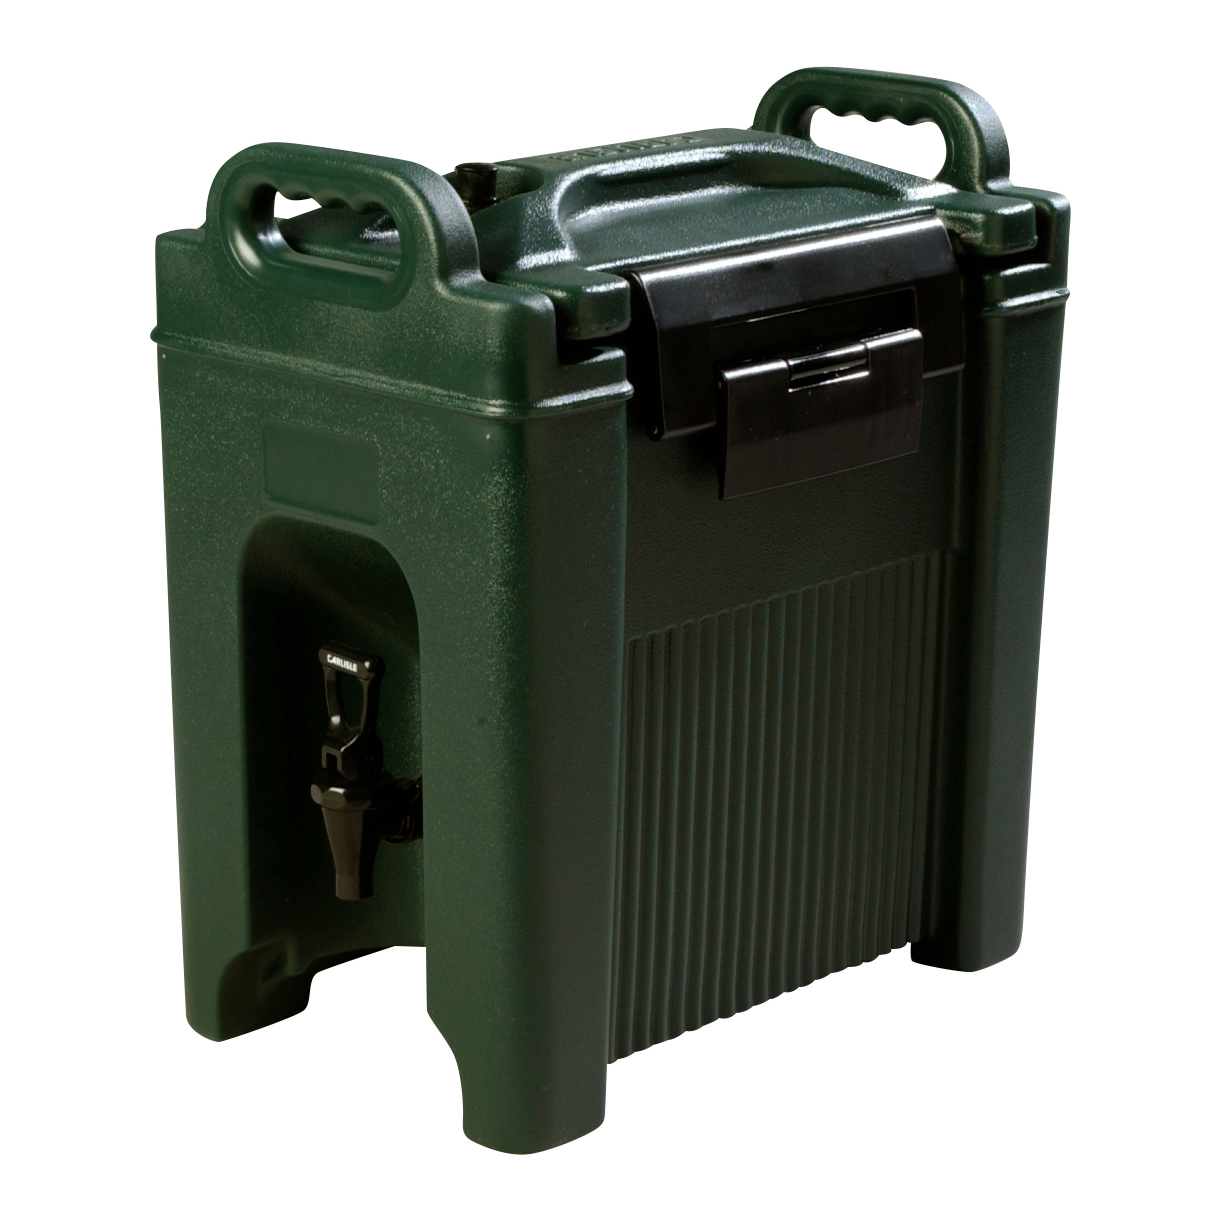 Carlisle XT250008 beverage dispenser, insulated